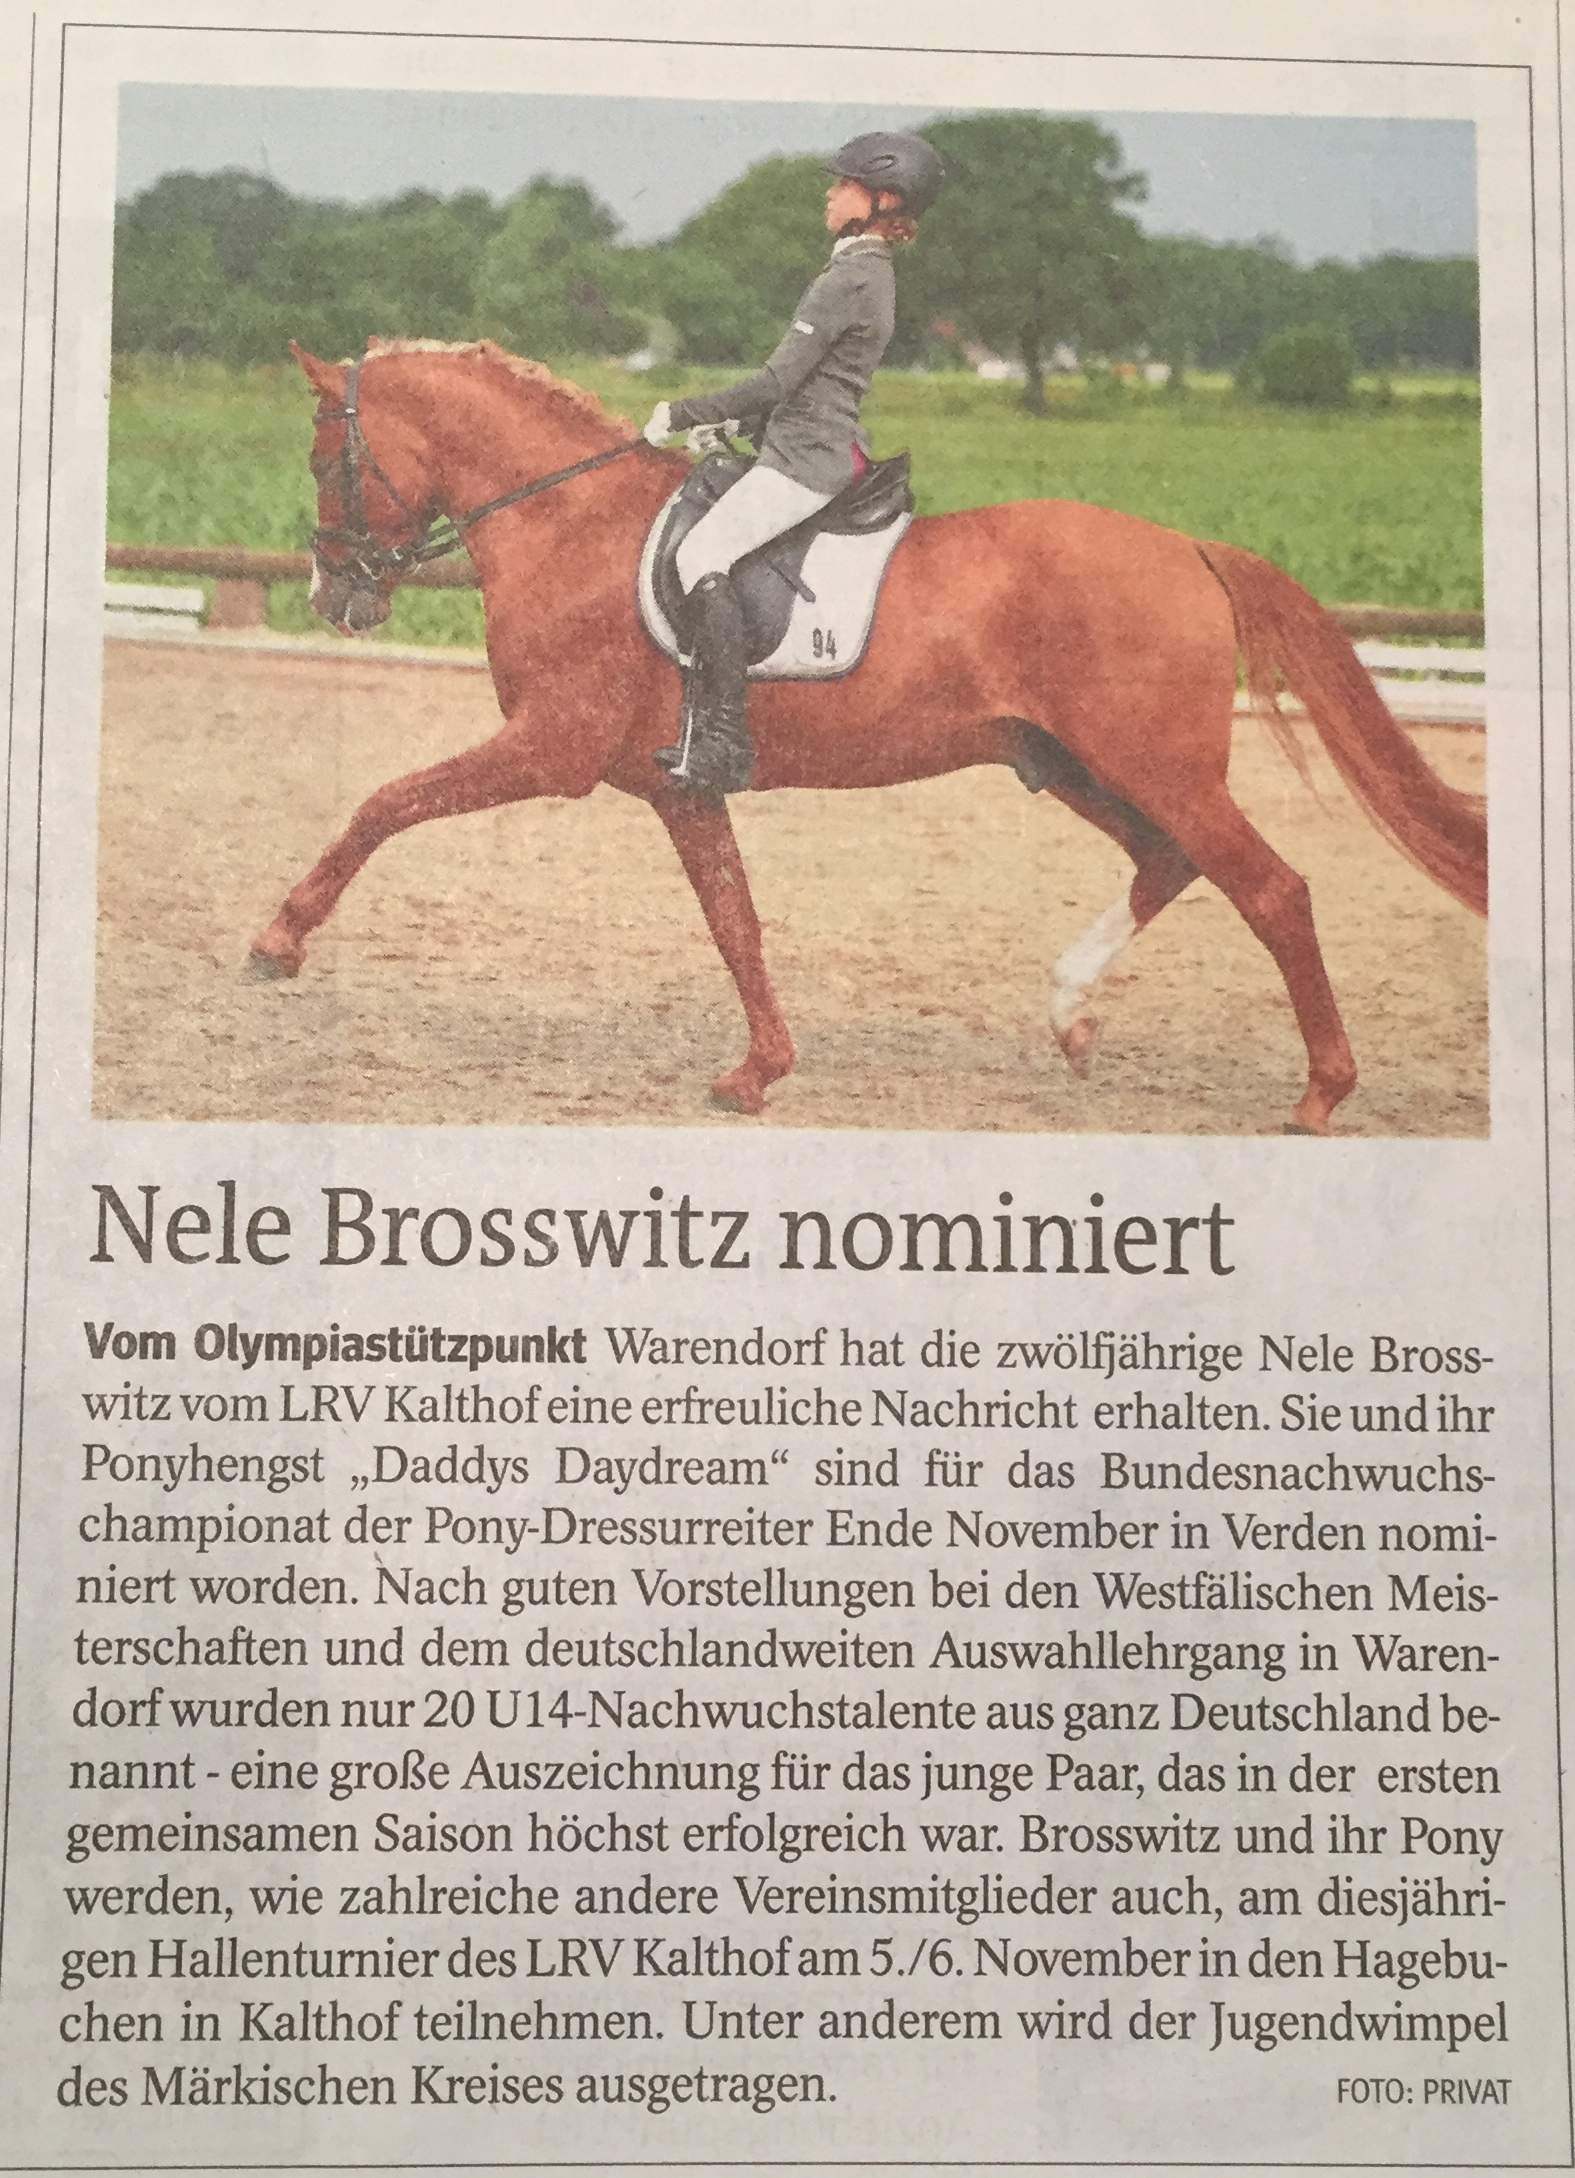 bericht-ikz-25-10-2016-bundesnachwuchsampionat